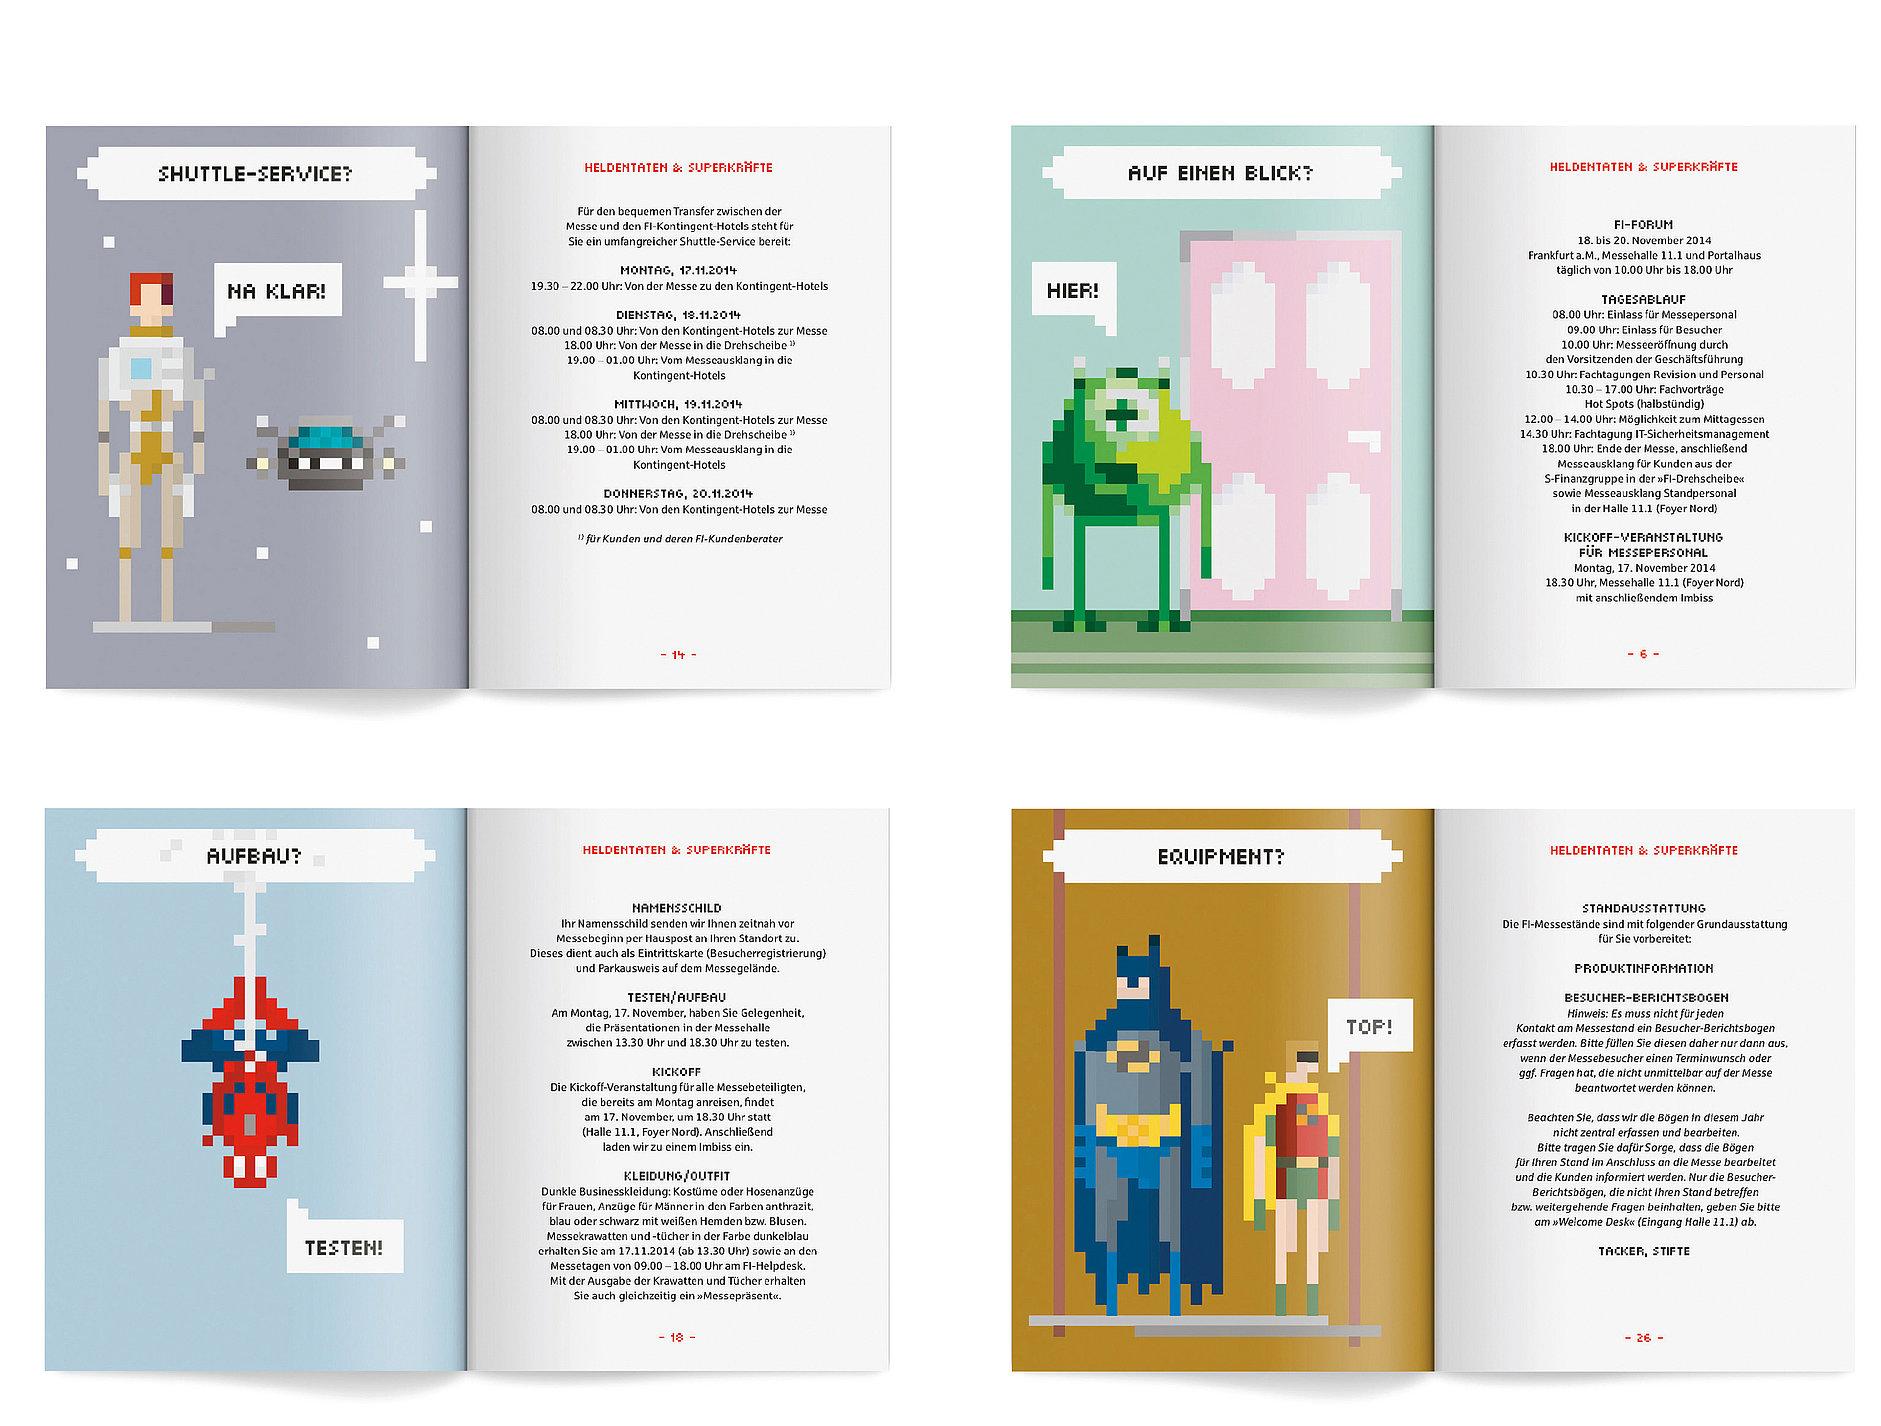 Heldentaten & Superkräfte | Red Dot Design Award